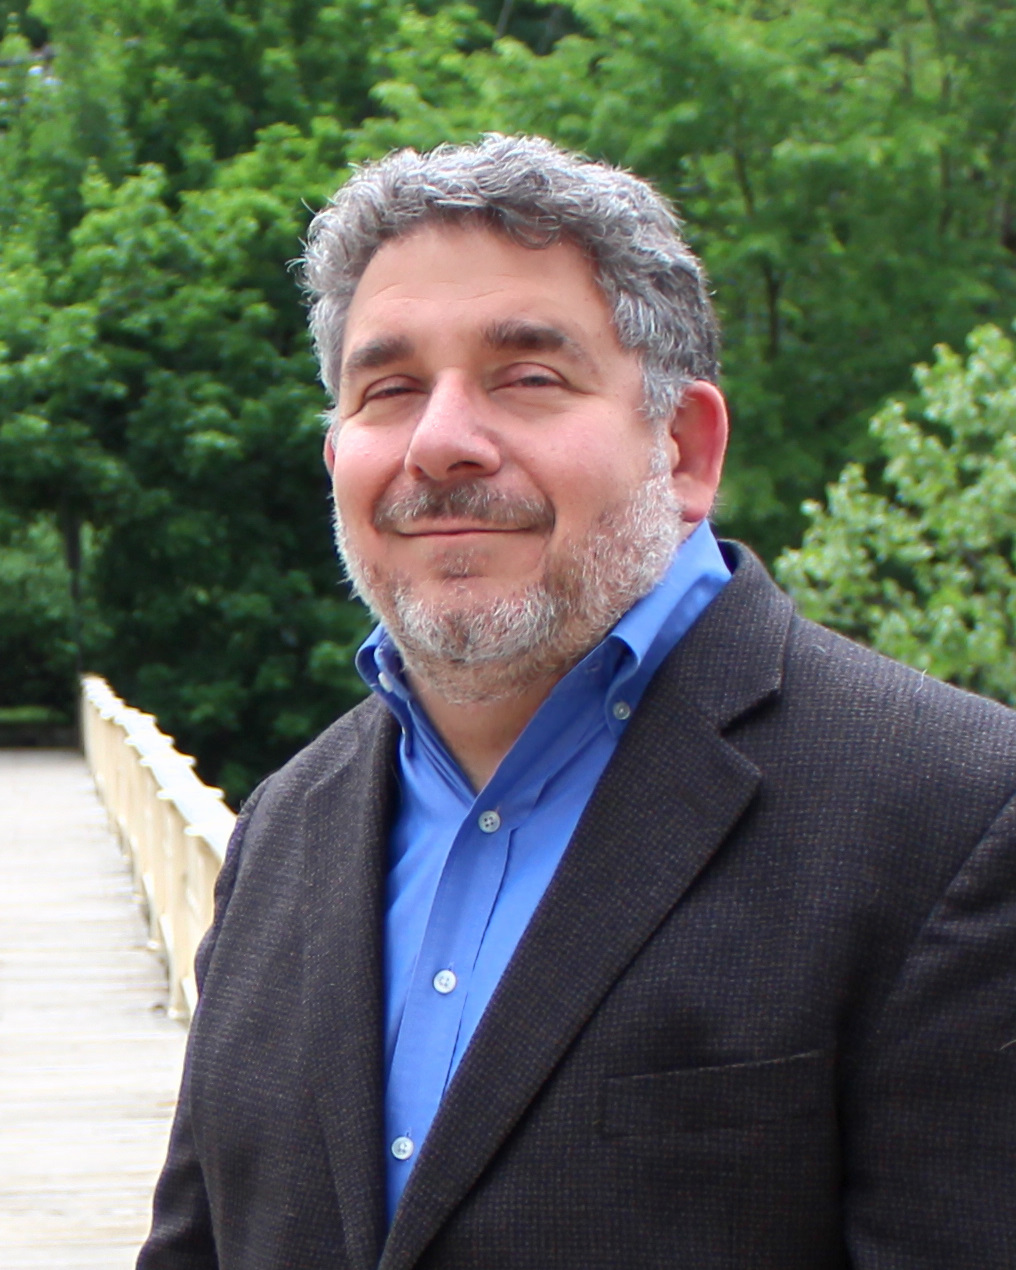 John Kashwick for Clinton Town Council